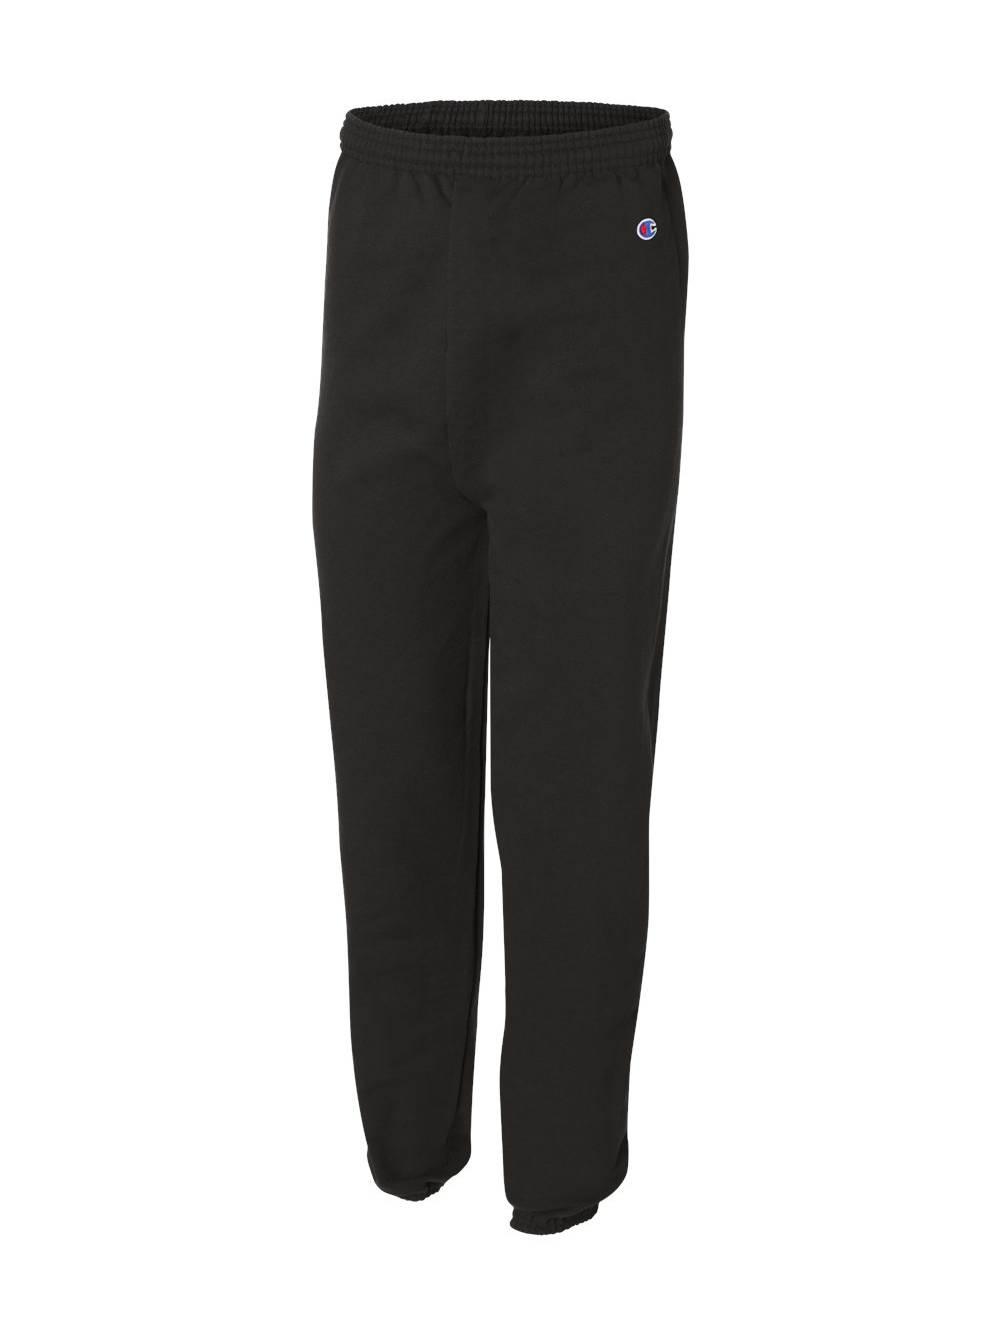 Champion - Eco Sweatpants with NO POCKETS